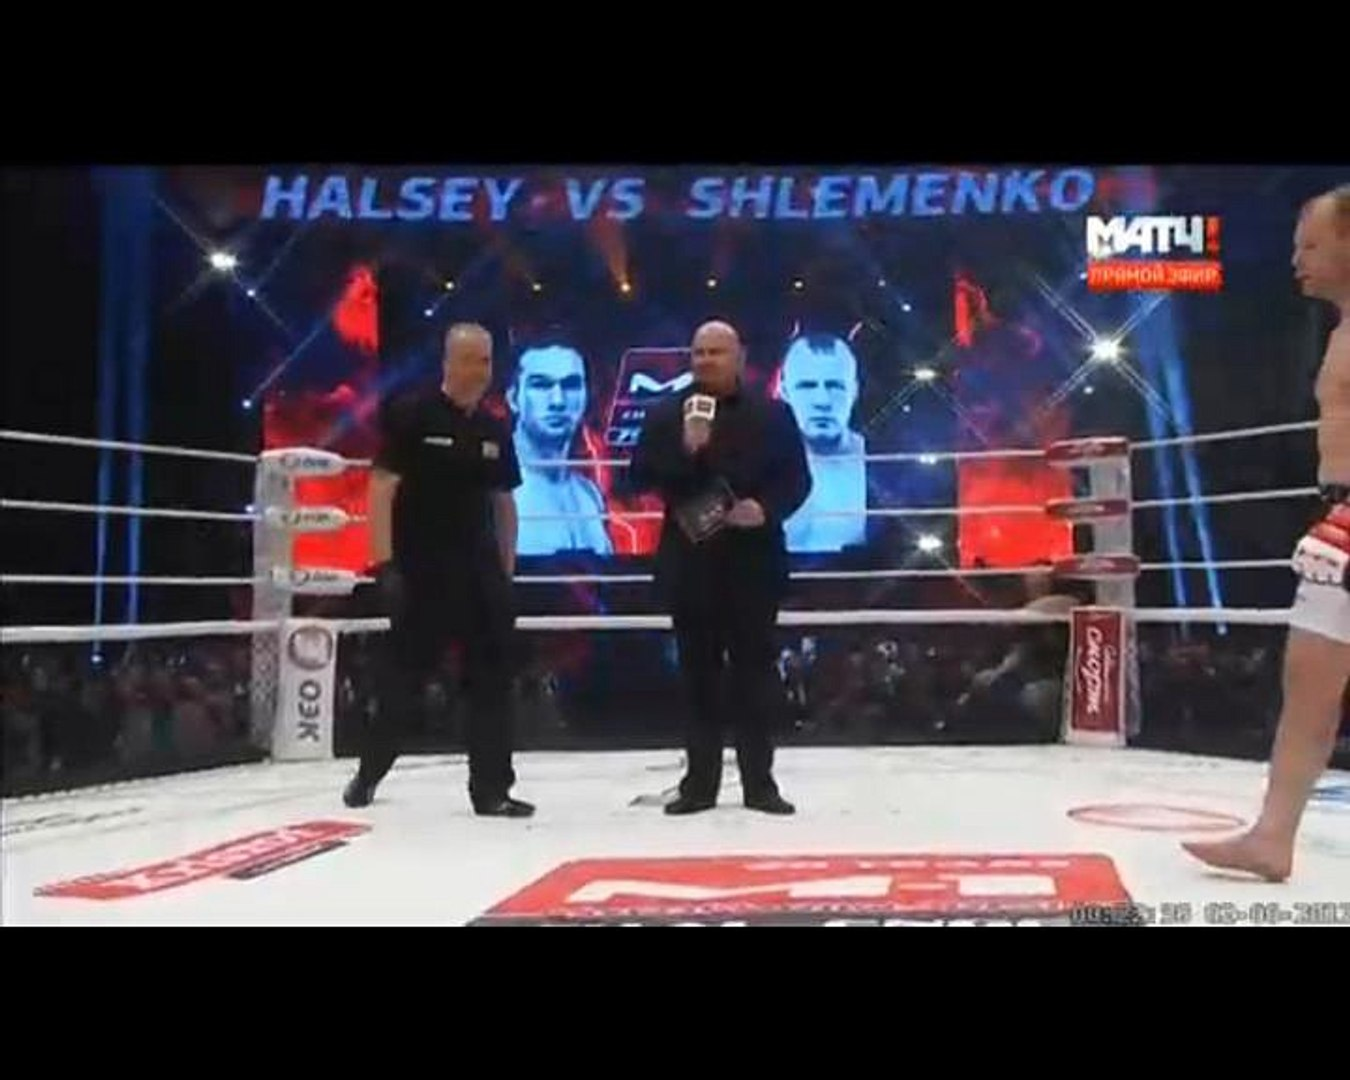 Alexander Shlemenko vs Brandon Halsey 2 - Full Fight / Александр Шлеменко - Брэндон Хэлси 2 - Полный